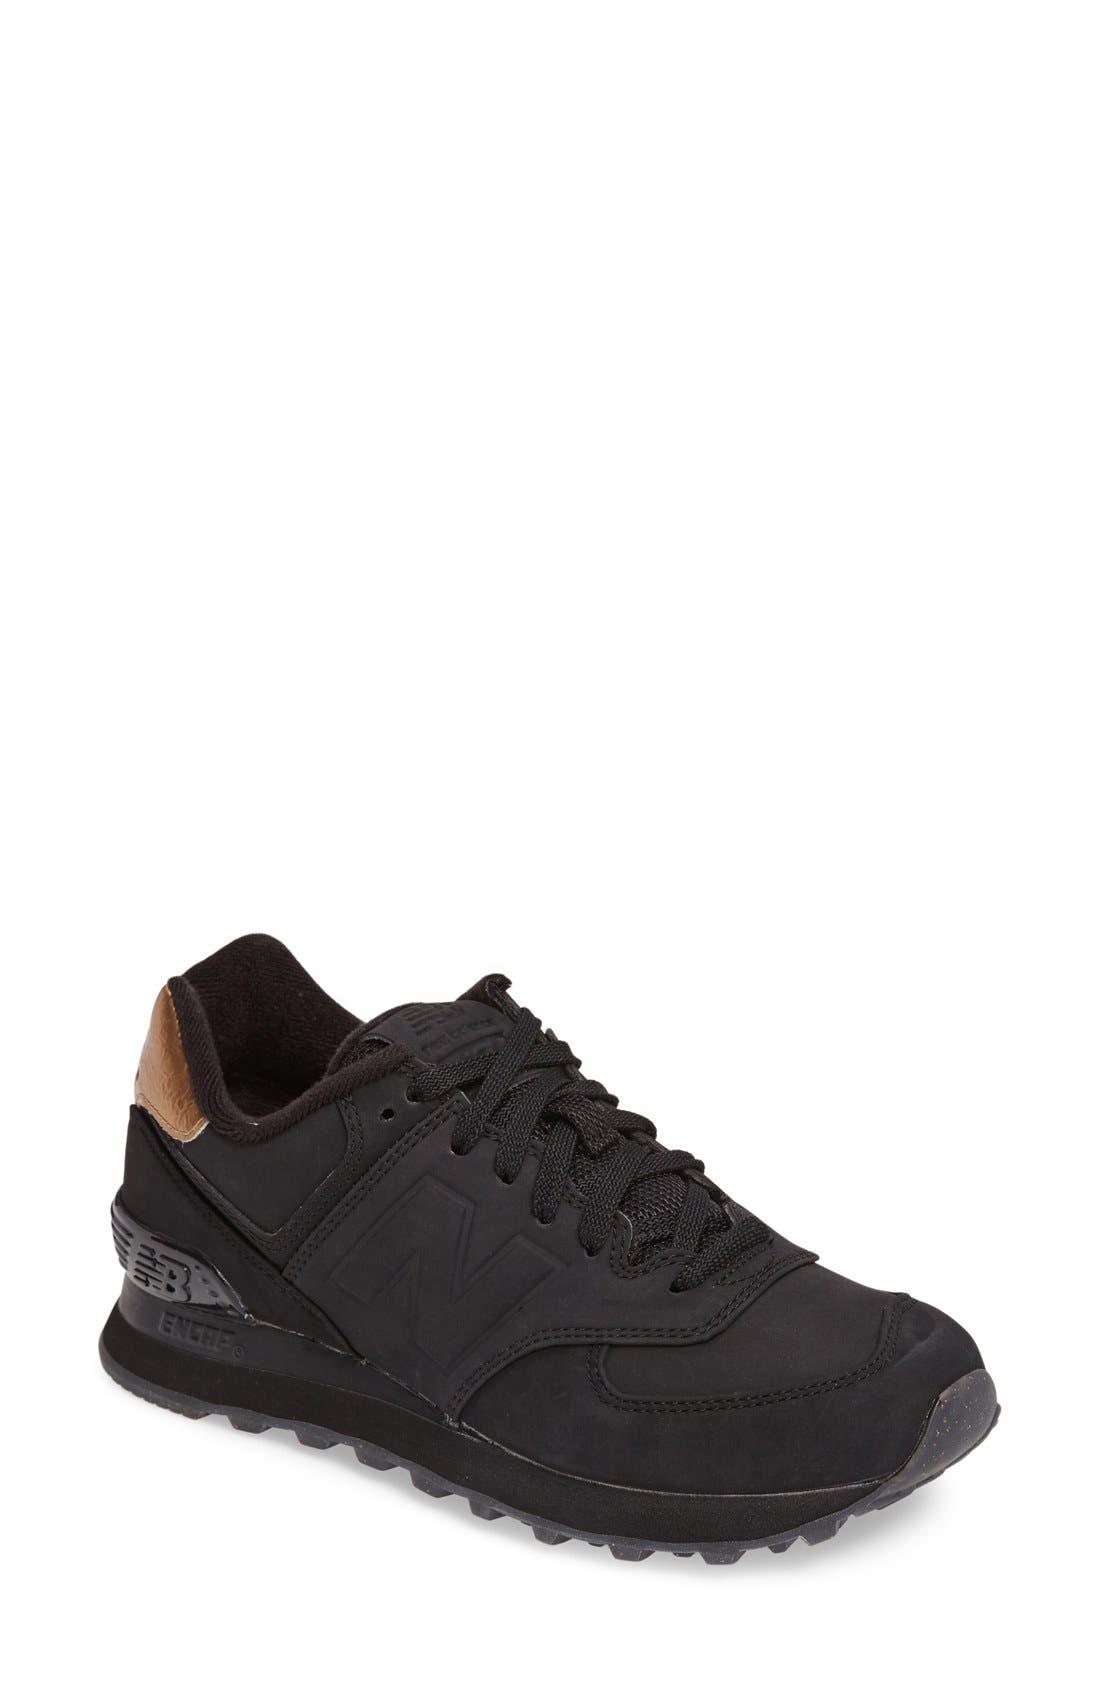 New Balance Q416 Retro 574 Sneaker (Women)